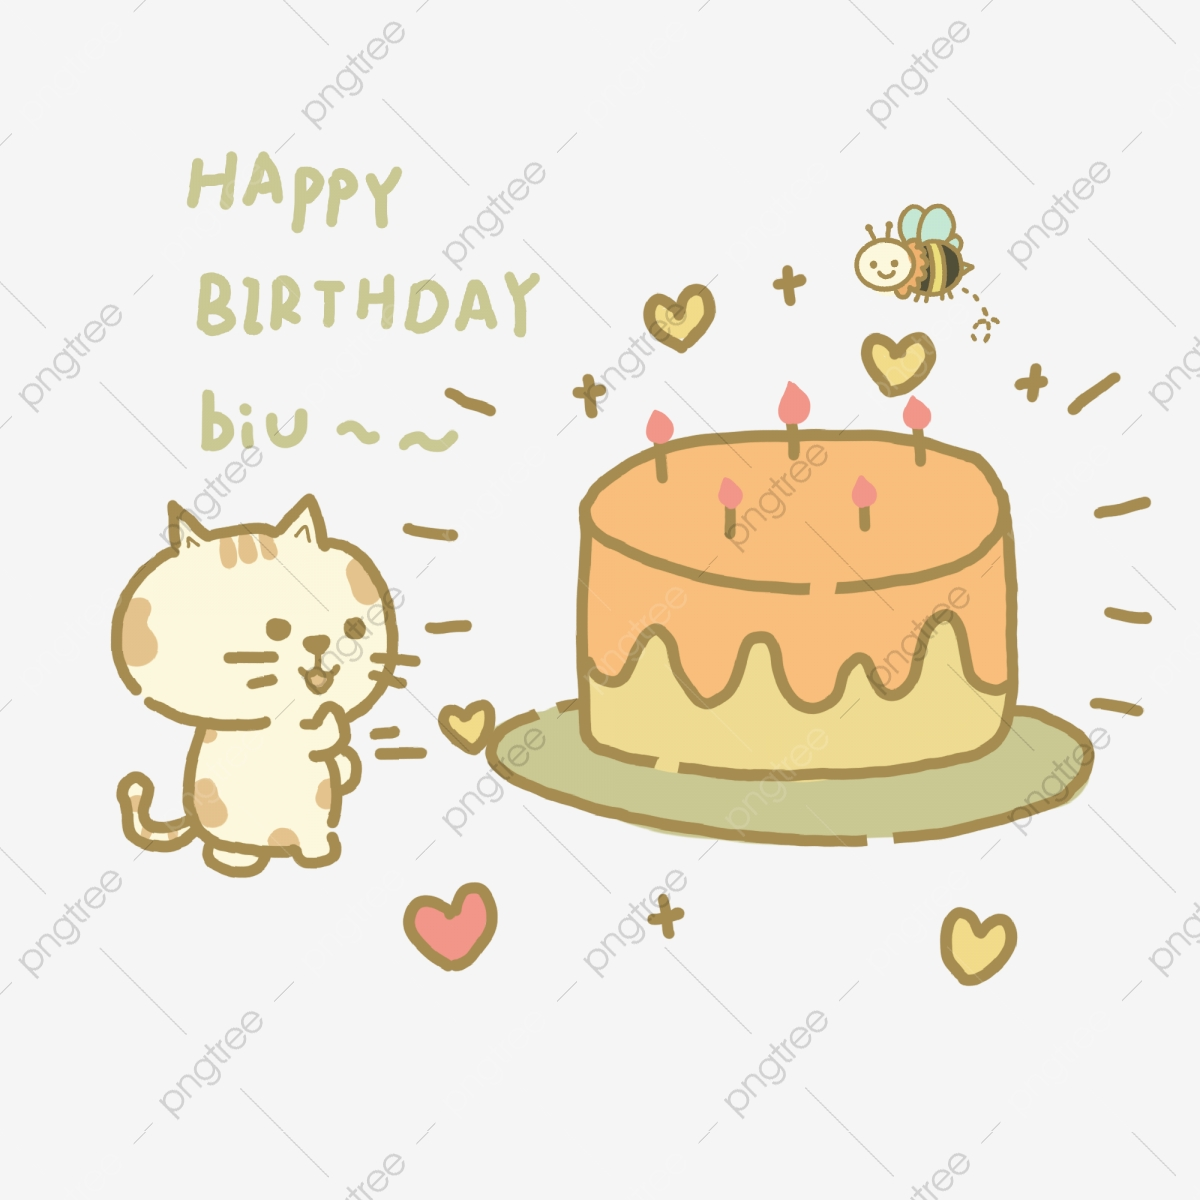 Groovy Cat Change Birthday Cake Emoticon Pack Happy Birthday Emoticon Funny Birthday Cards Online Unhofree Goldxyz